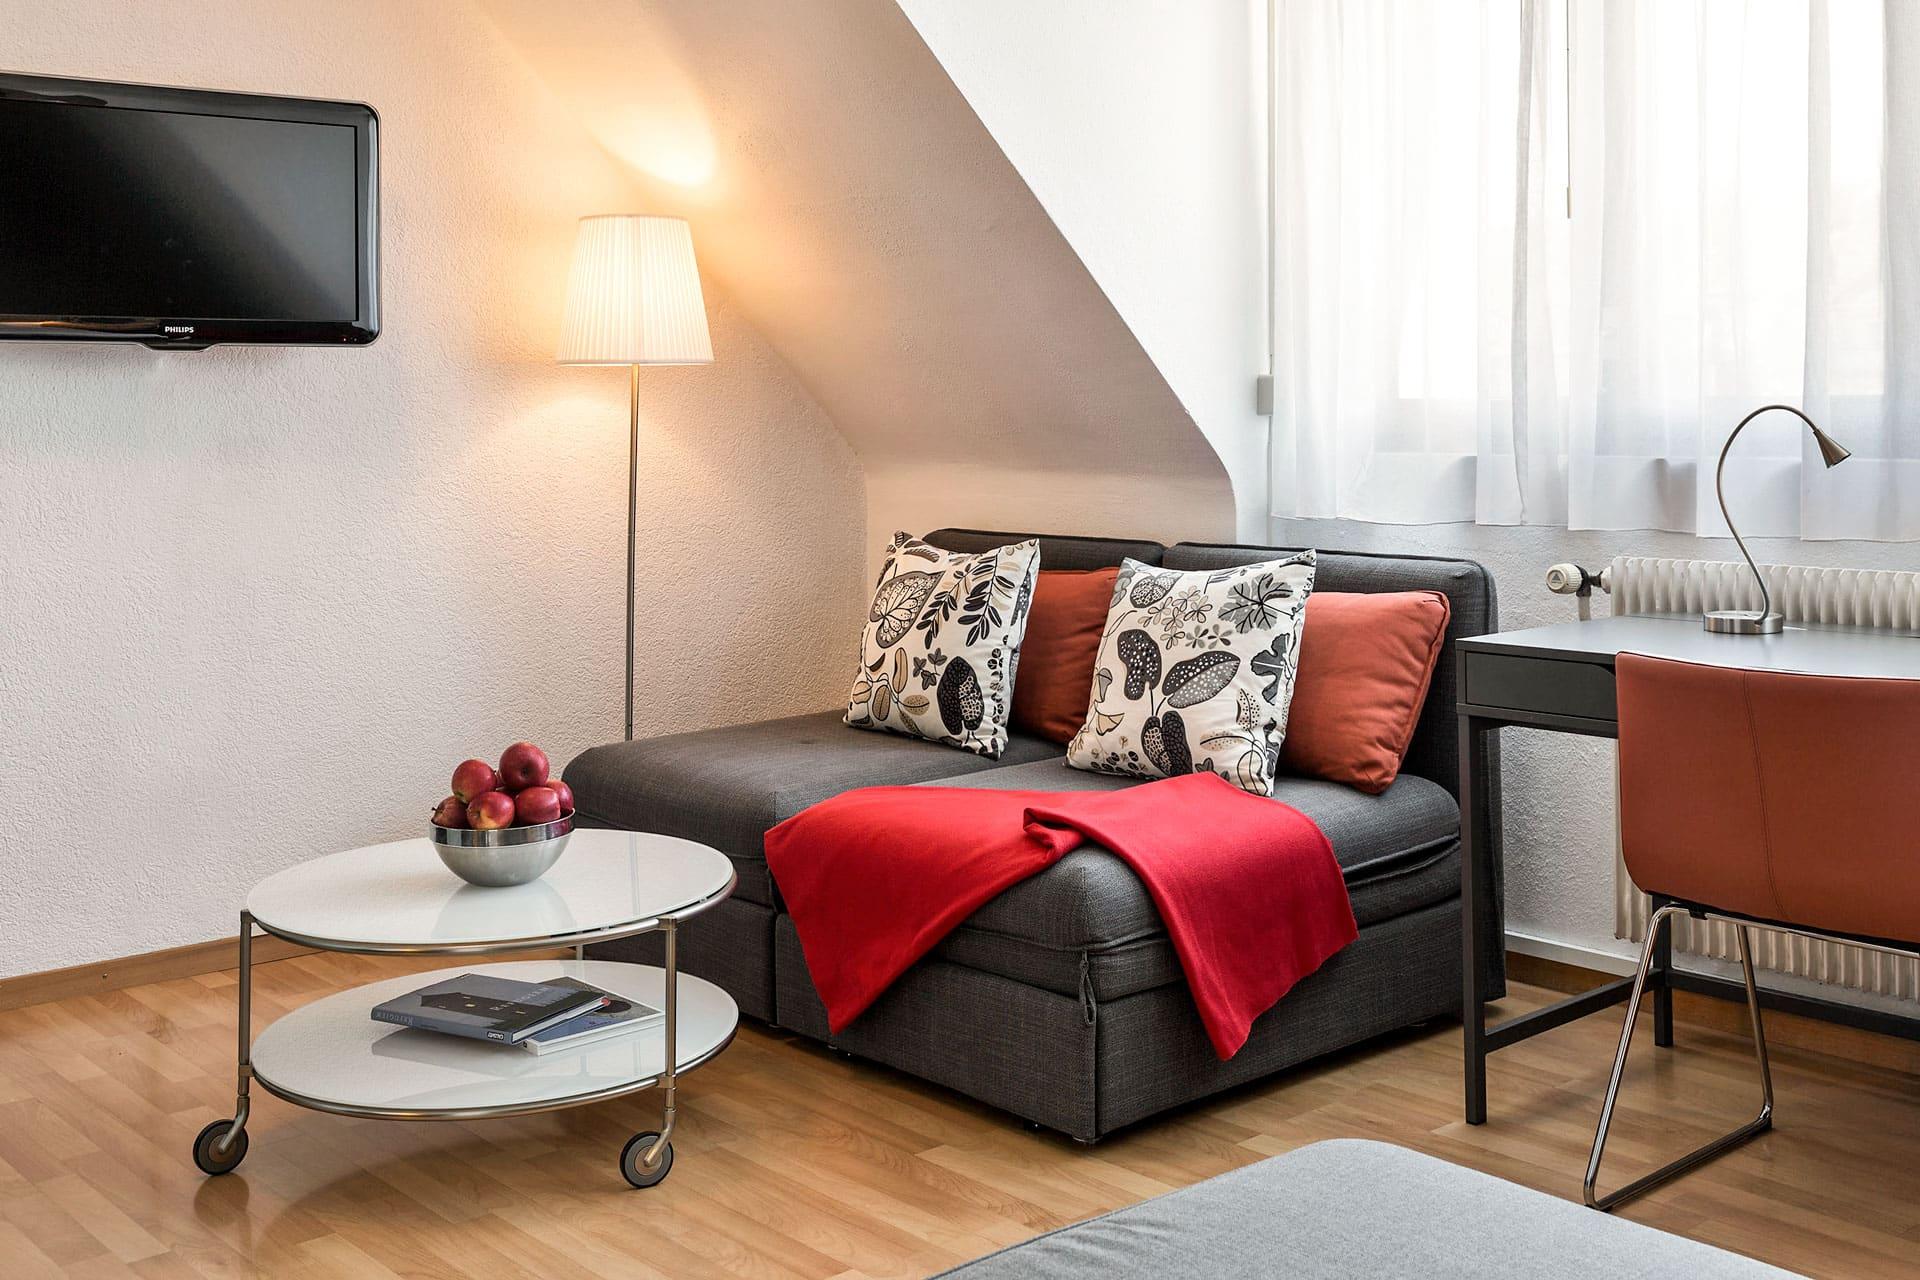 Superior Room lounge area at The La Pergola Hotel